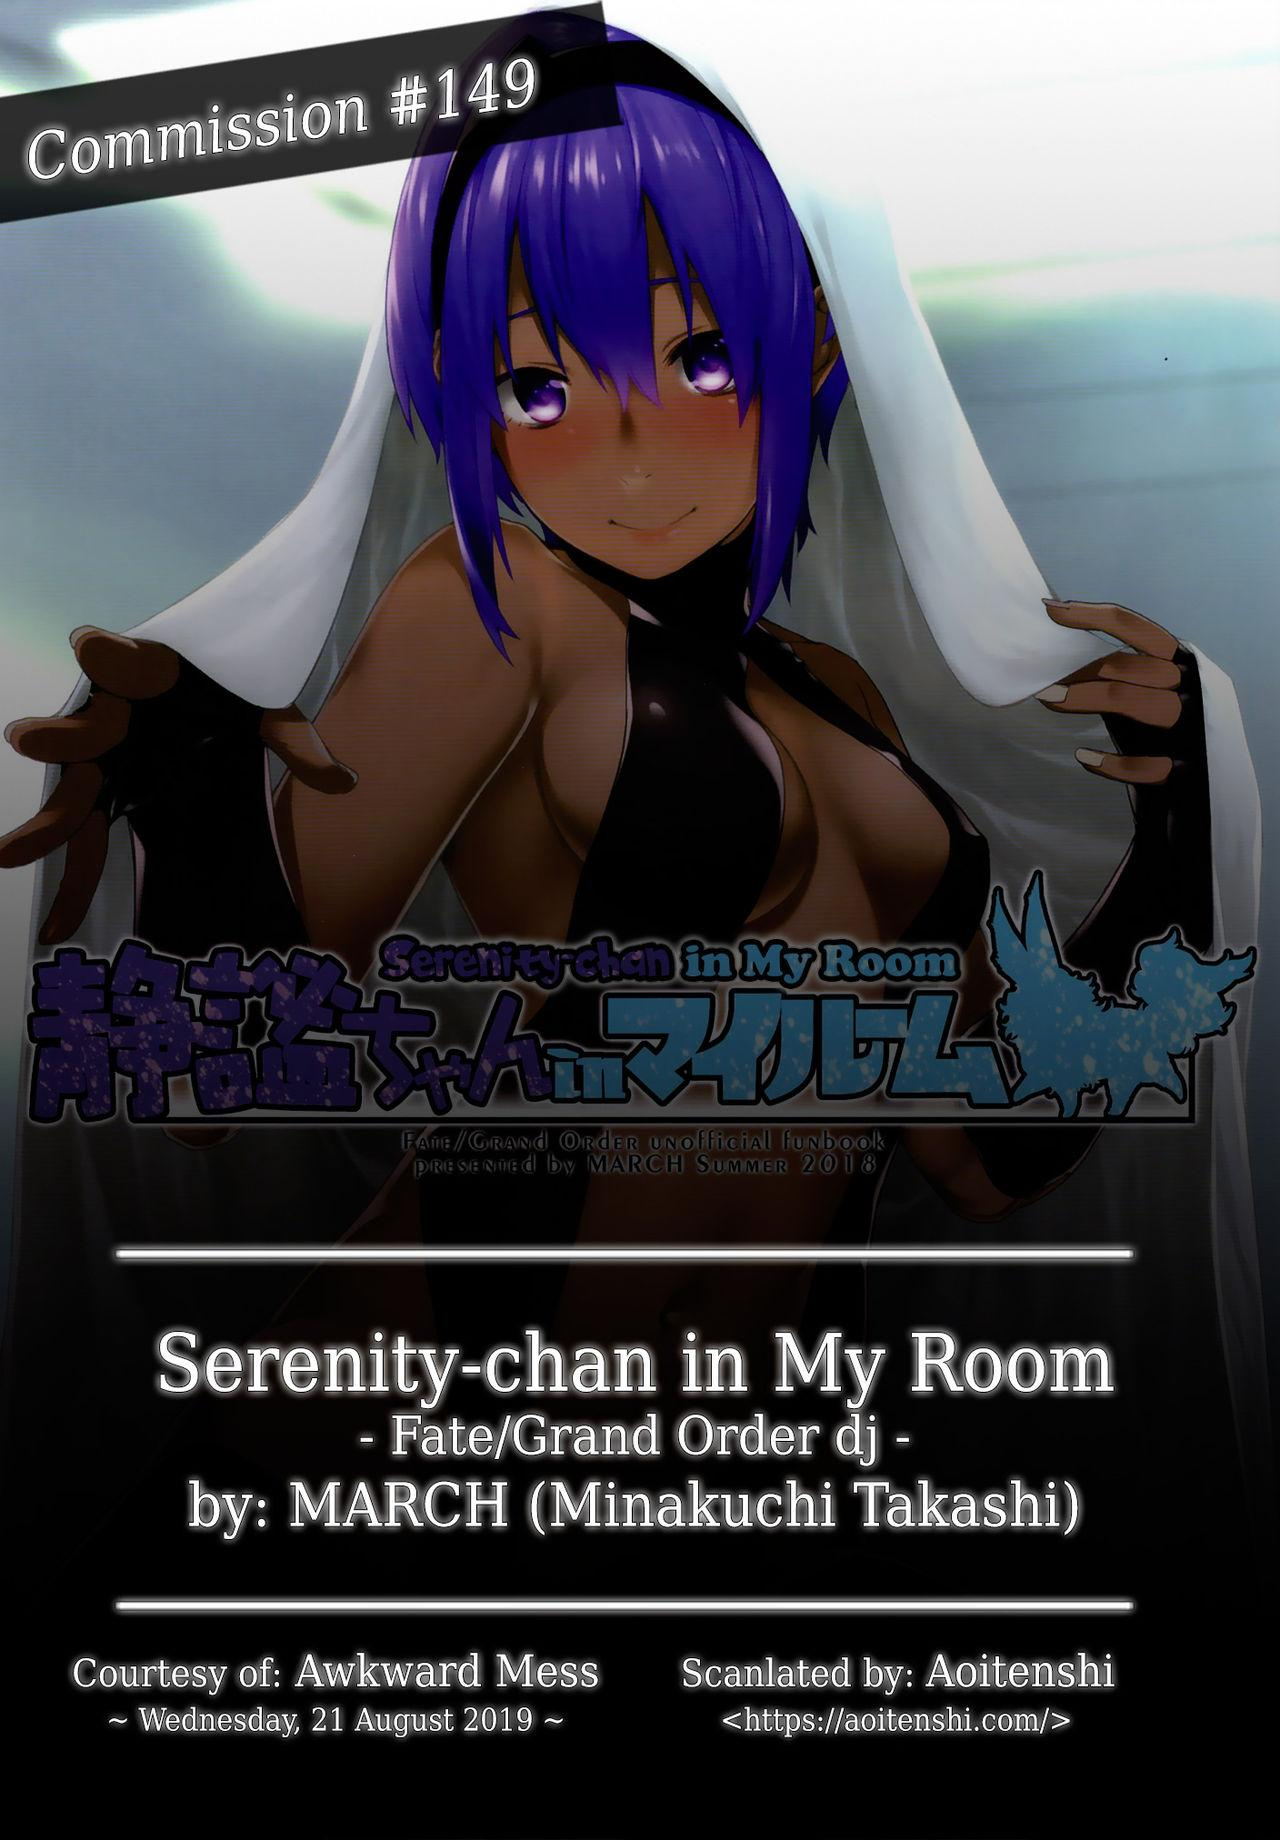 [MARCH (Minakuchi Takashi)] Seihitsu-chan In My Room | Serenity-chan in My Room (Fate/Grand Order) [English] [Aoitenshi] [Digital] 1